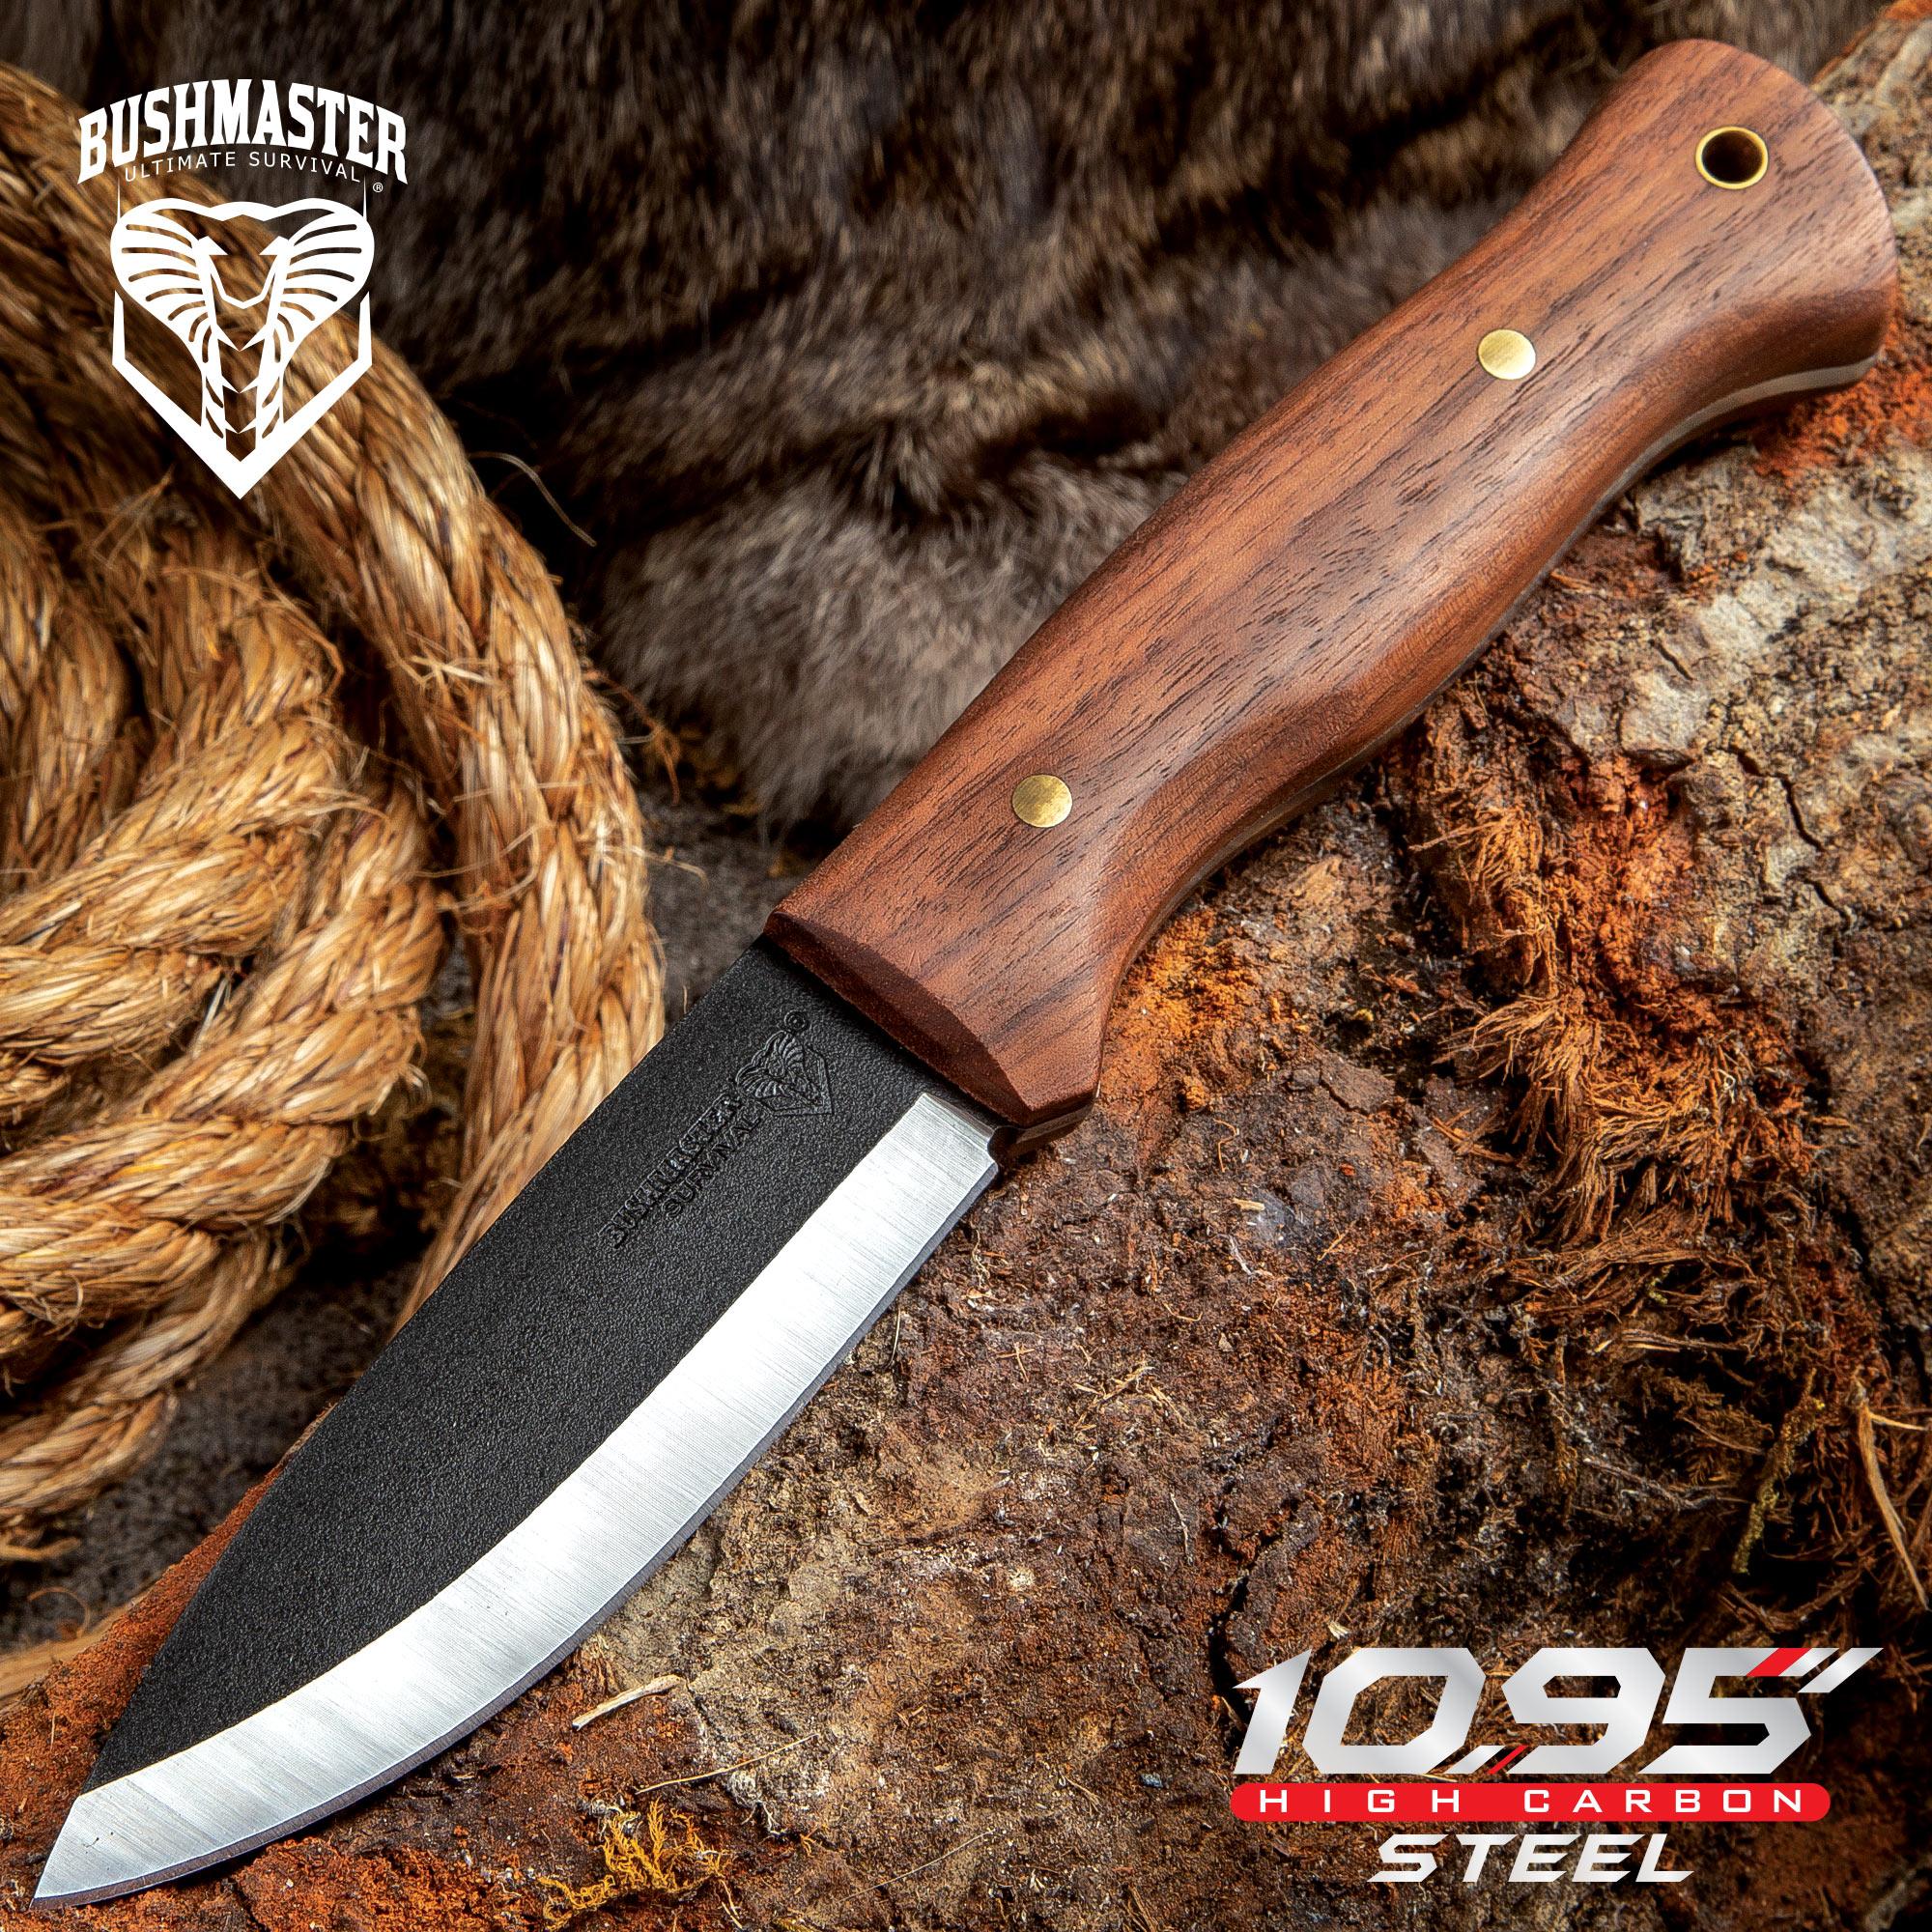 "Bushmaster Bushcraft Explorer Fixed Blade Knife - 1095 Carbon Steel Blade,  Zebra Wood Handle, Brass Pins And Lanyard Hole - Length 9 5/8"""